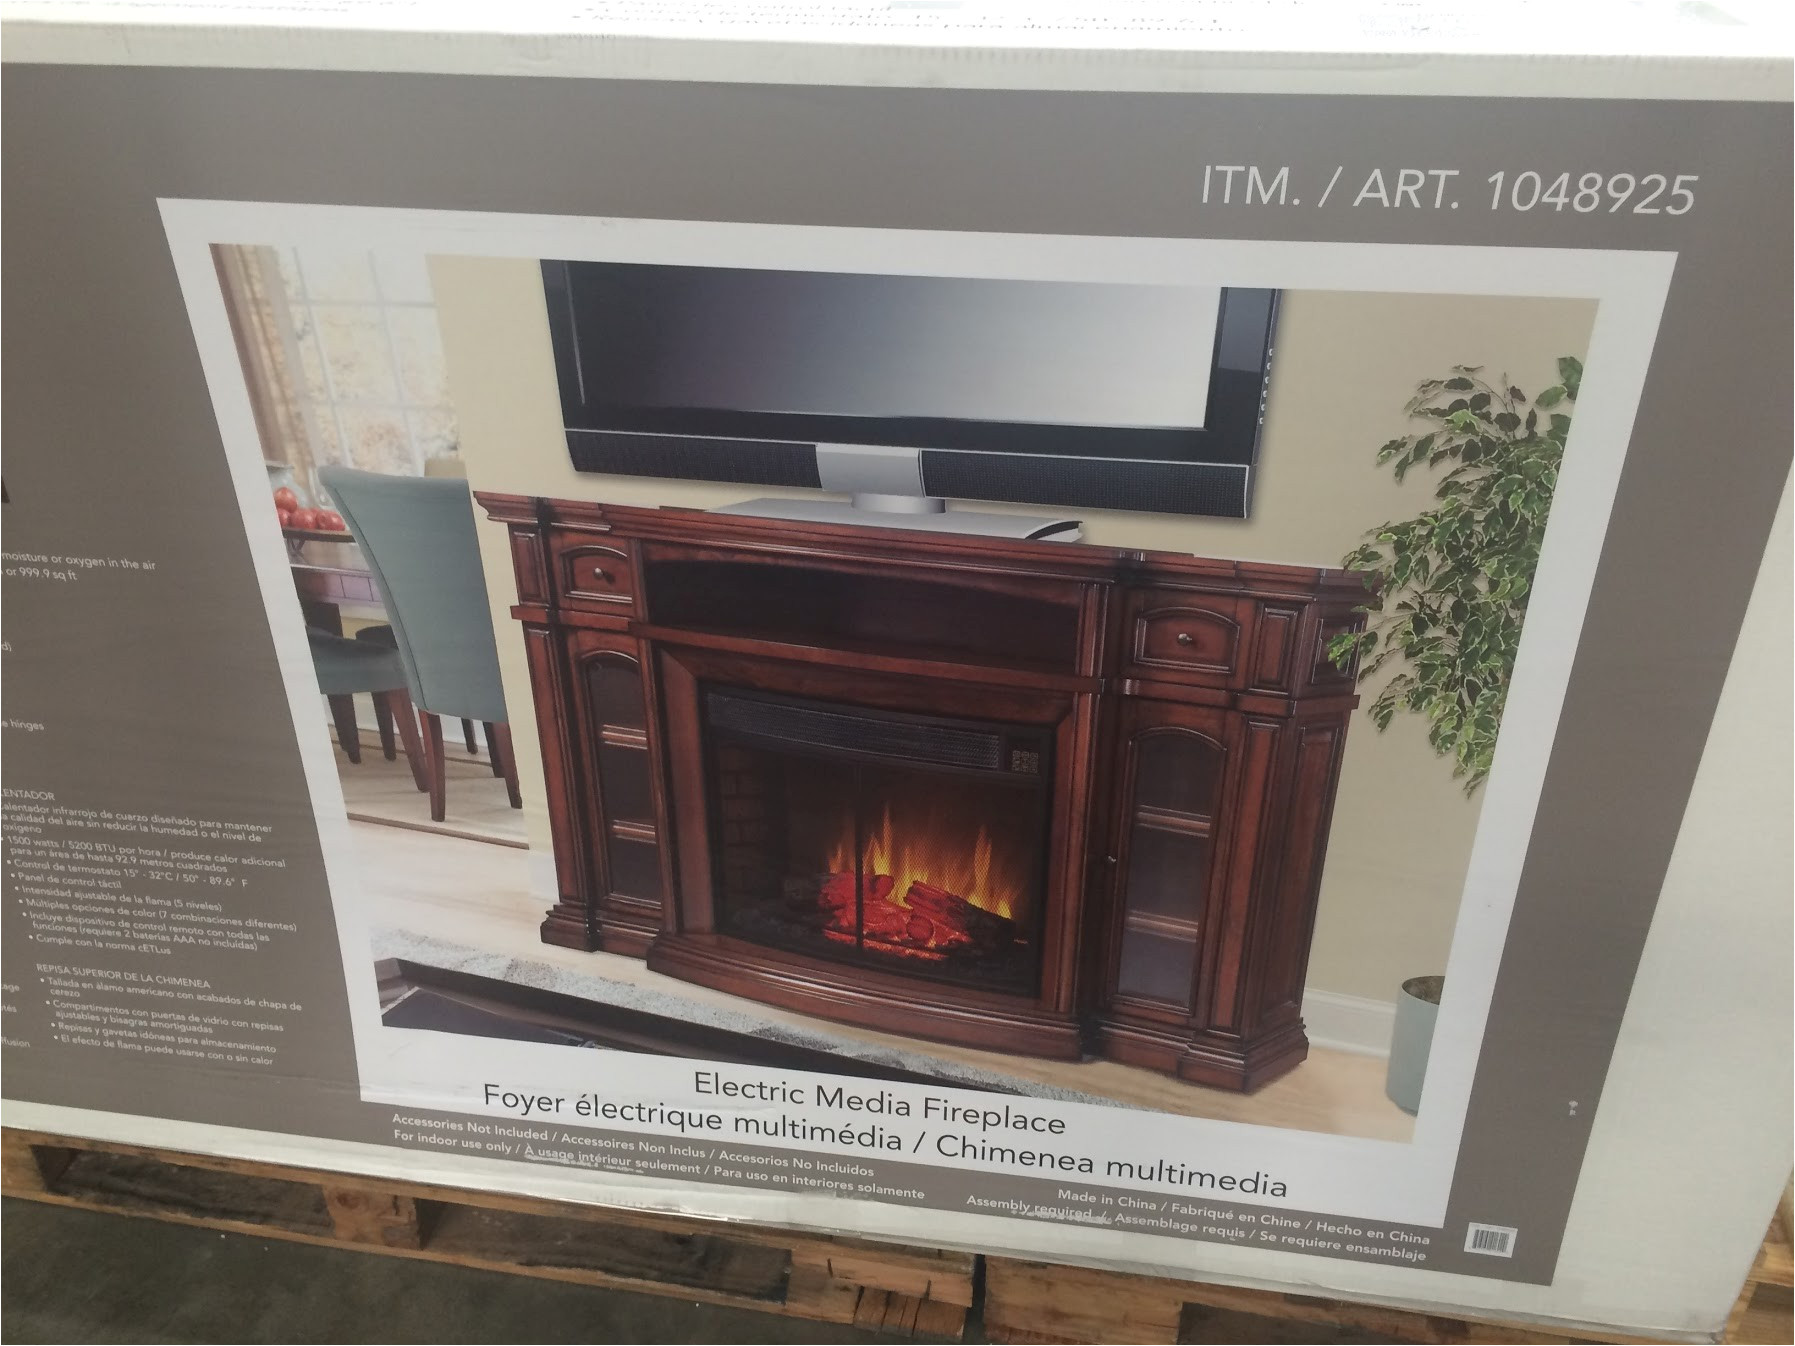 Ember Hearth Electric Media Fireplace Costco the Super Free Electric Fireplace Heater Costco Images Biz Momentum